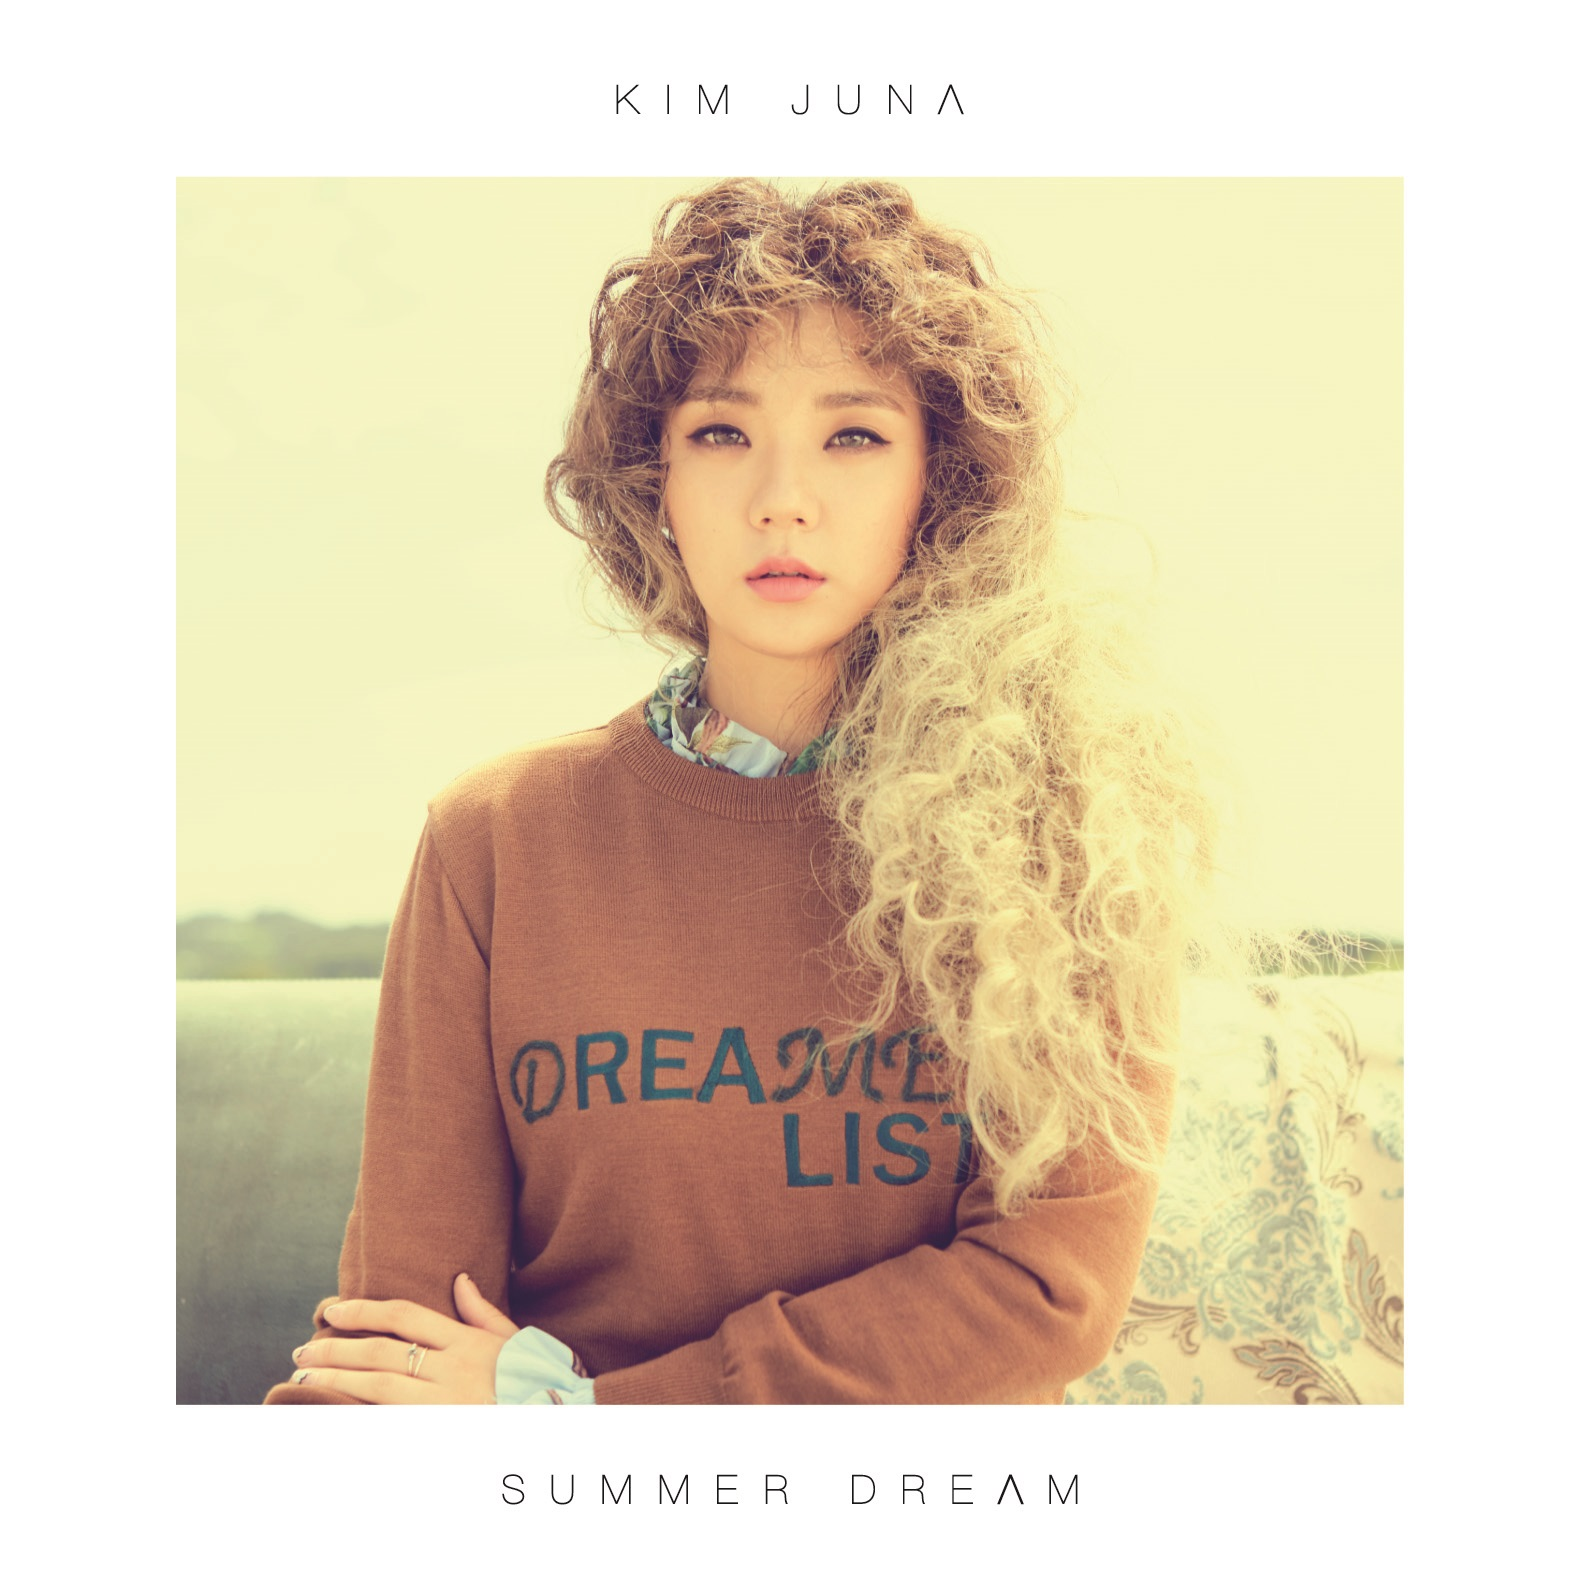 20170415.0846.11 Kim Juna - Summer Dream cover.jpg